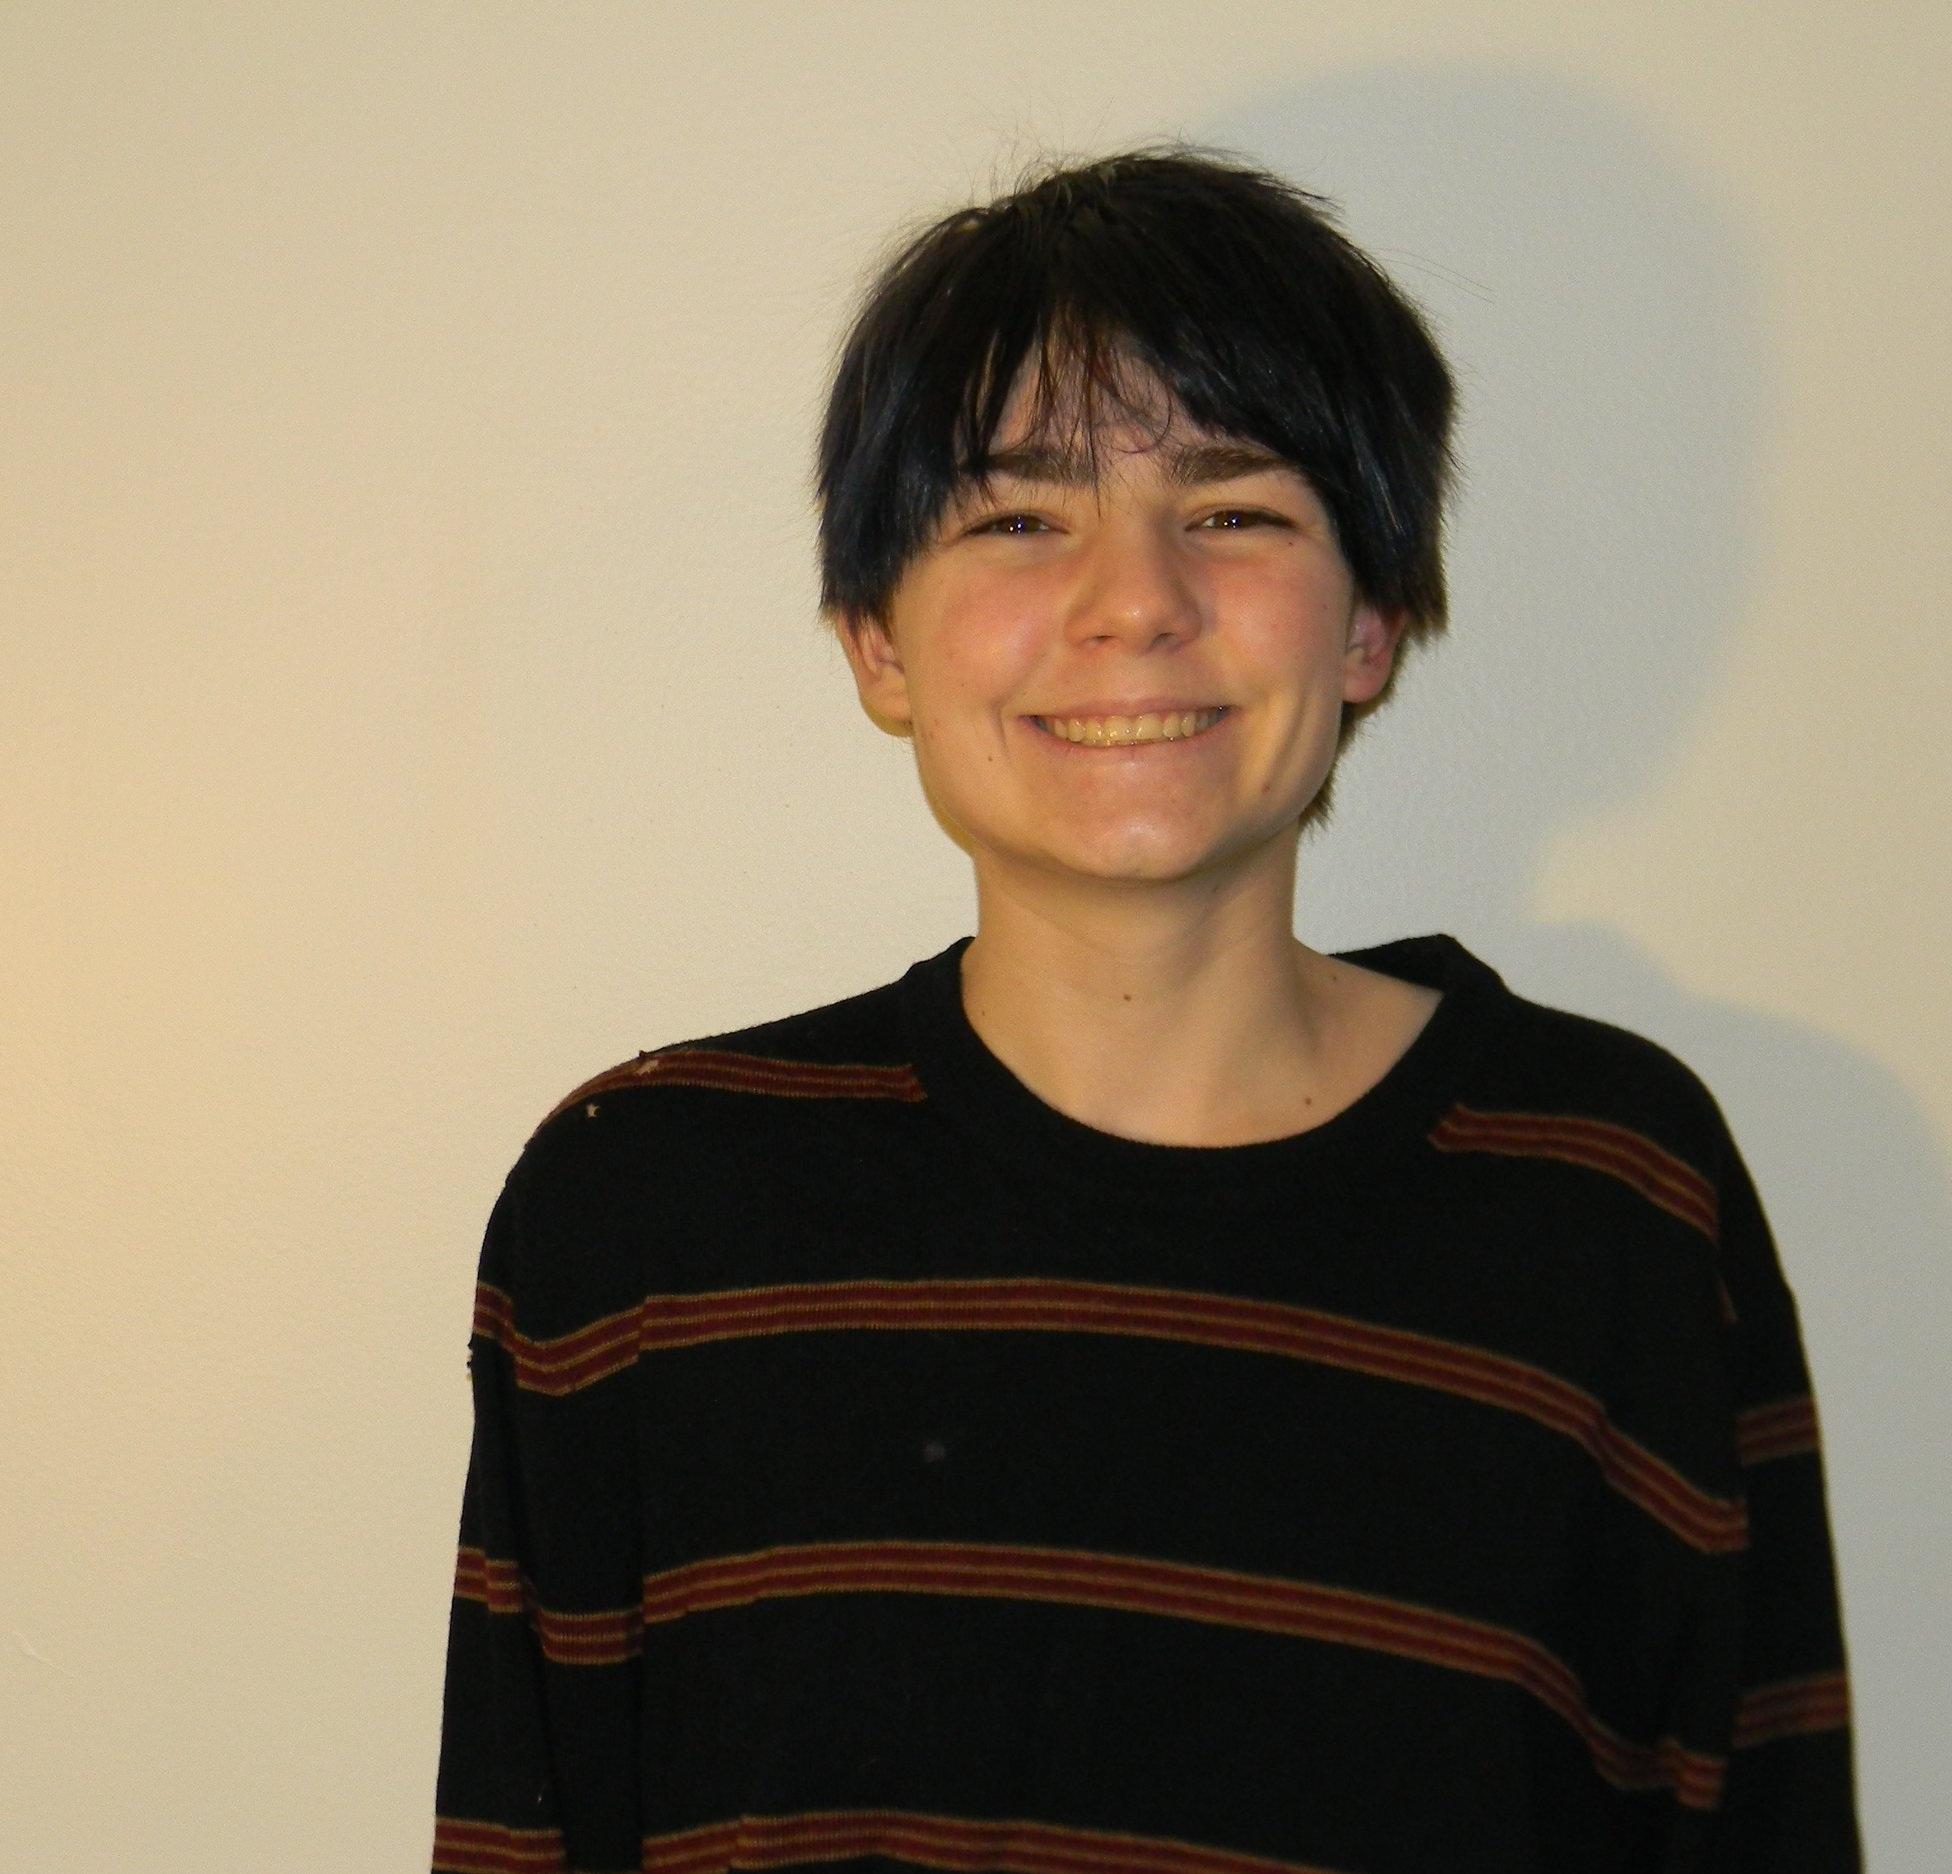 Avery Laur - 12th Grade Student,Ursuline Academy